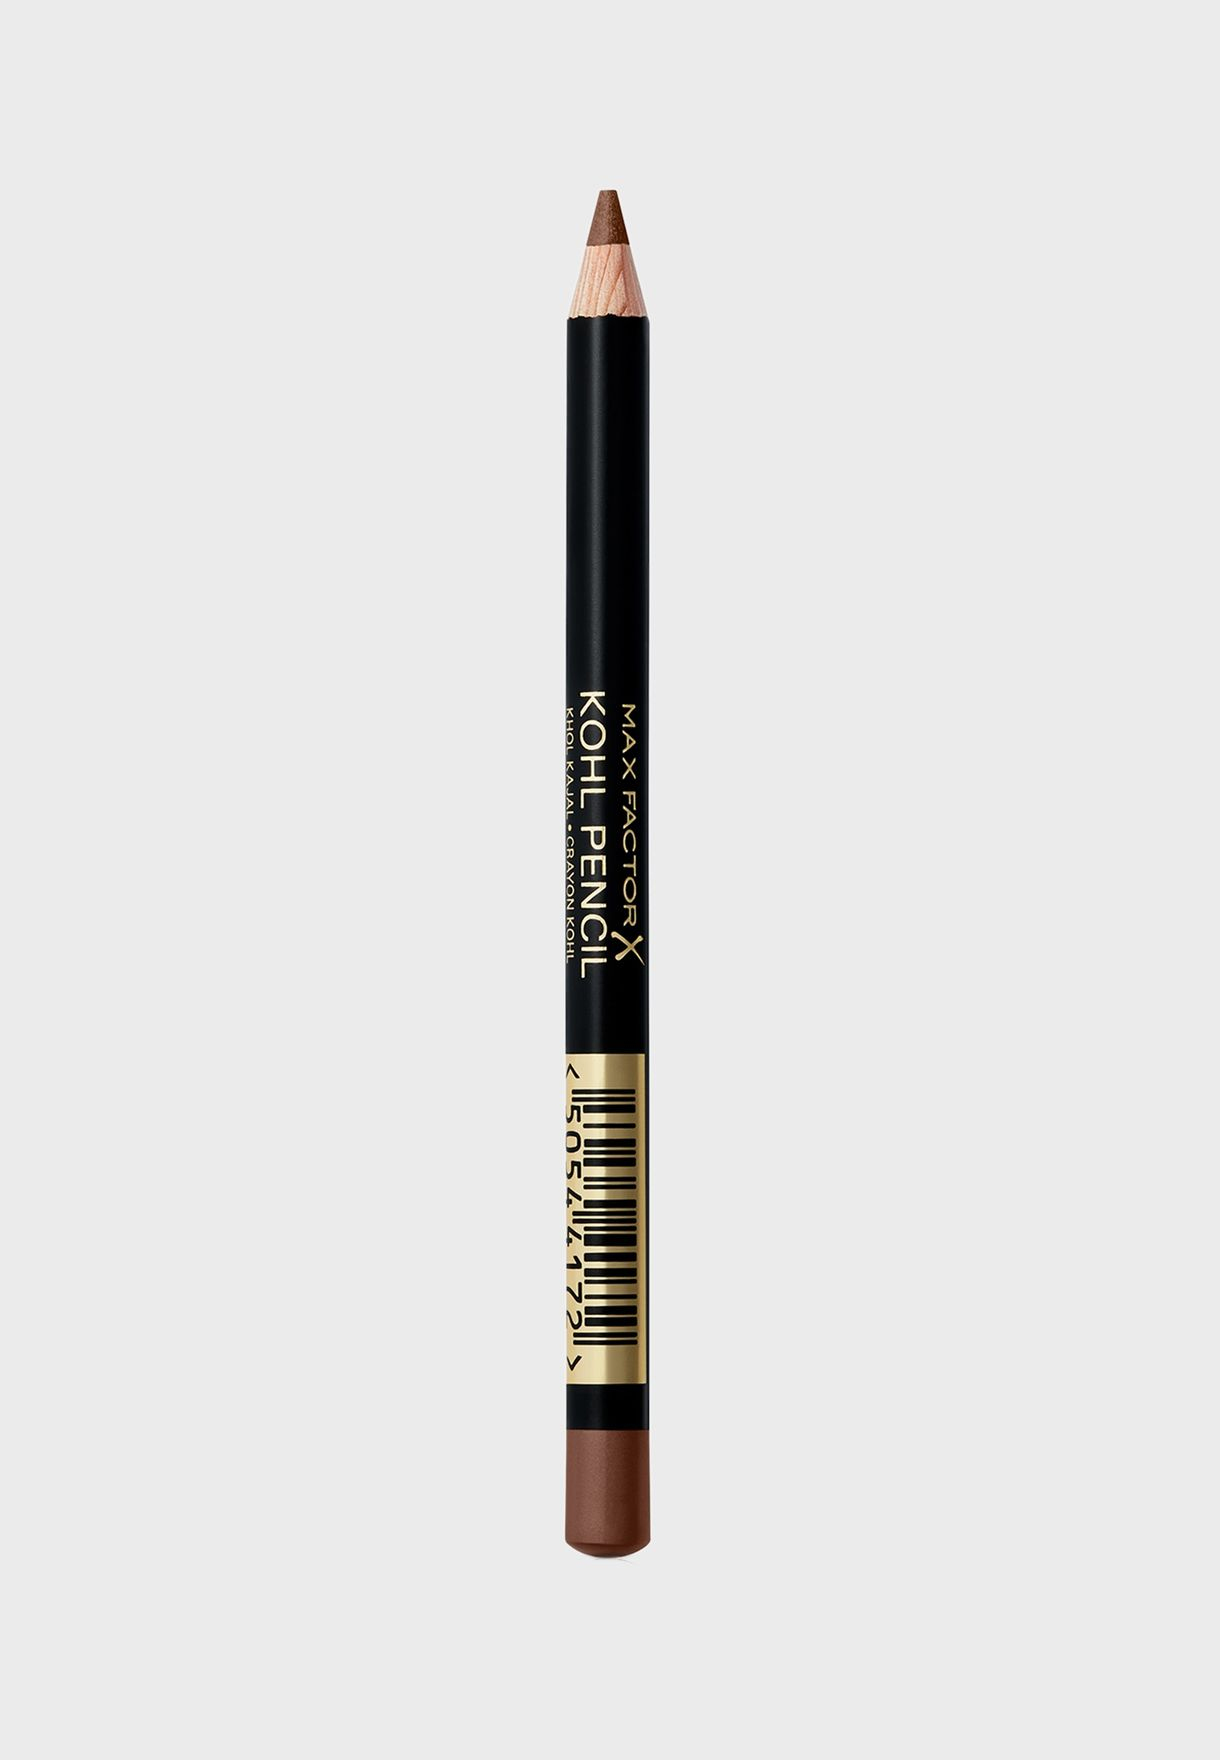 Kohl Pencil Eyeliner- 40 Taupe